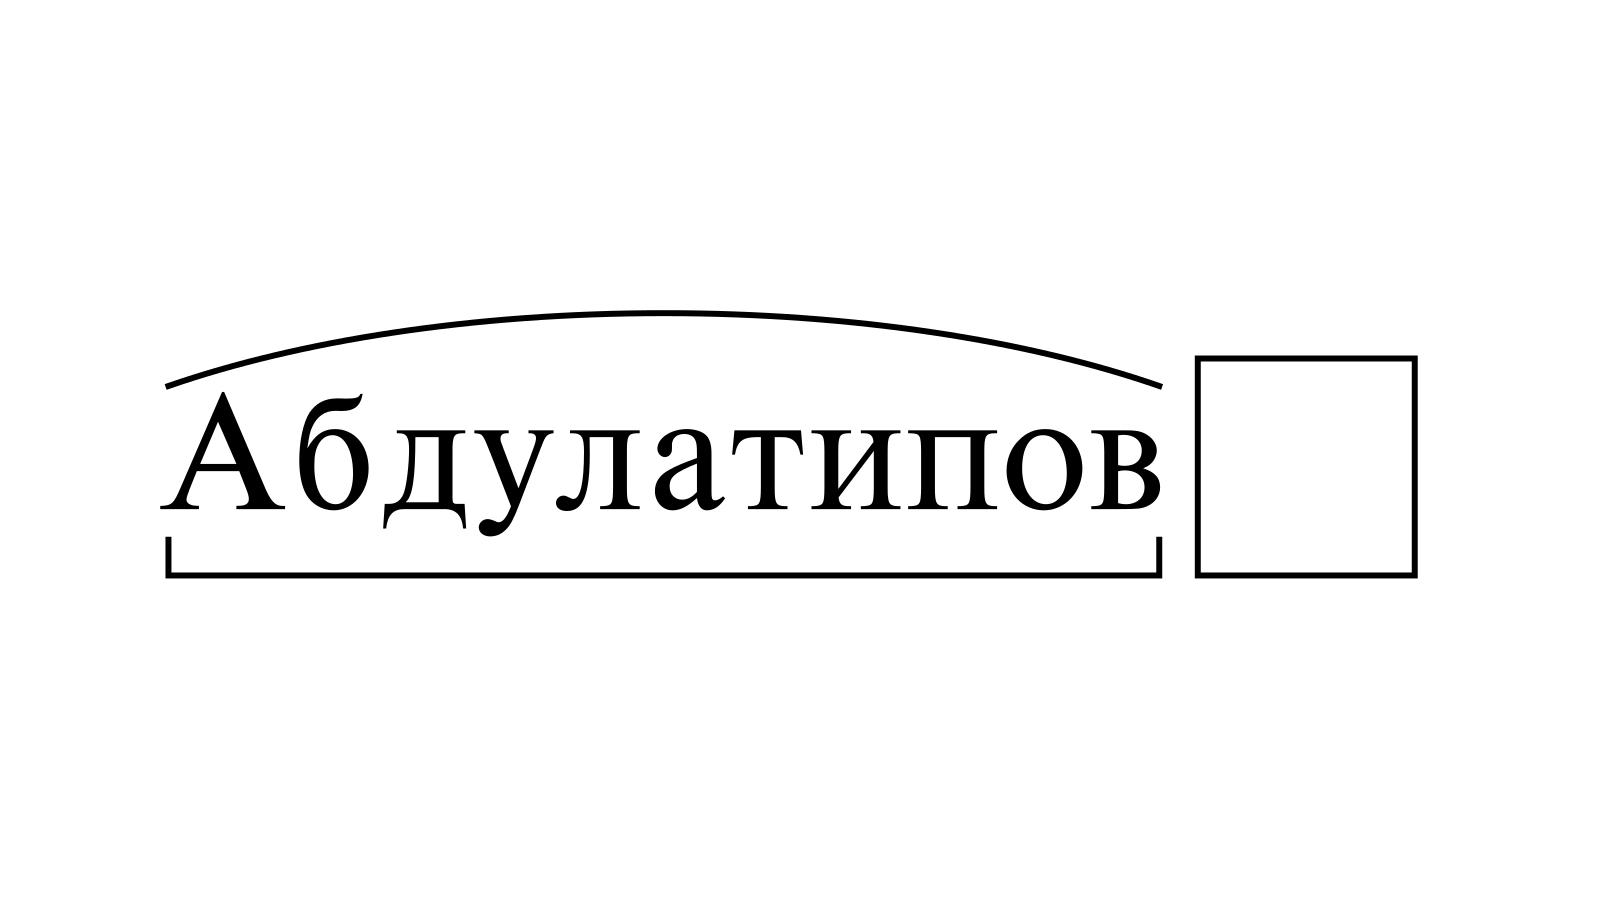 Разбор слова «Абдулатипов» по составу